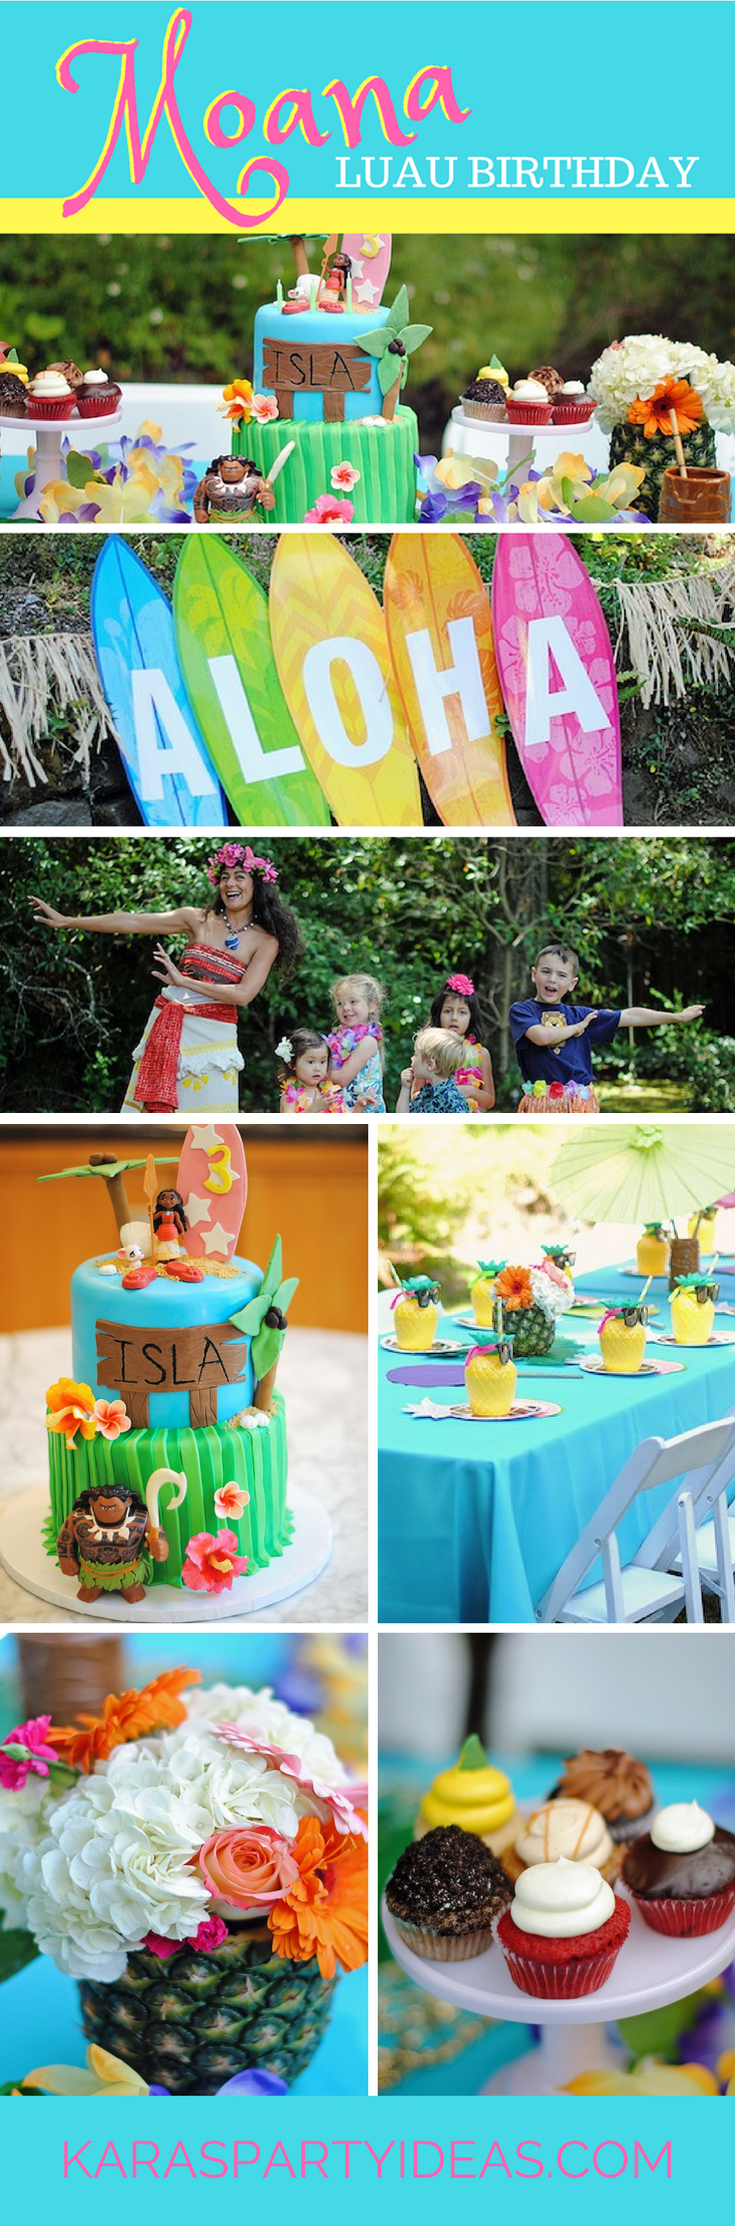 Moana Luau Birthday Party via Kara's Party Ideas